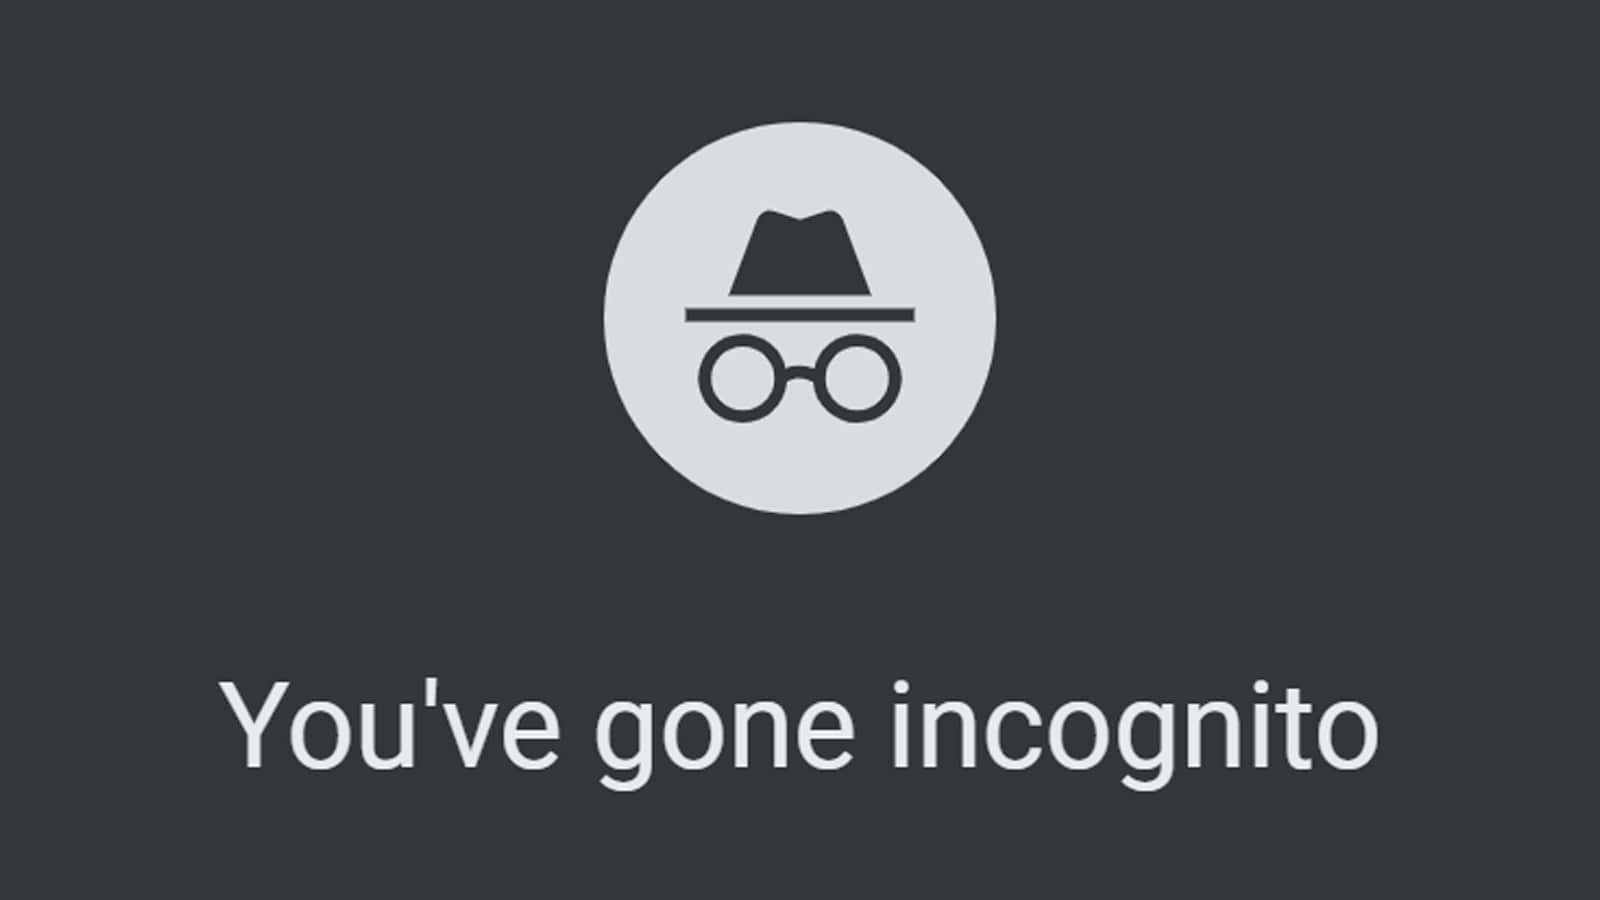 google incognito mode logo